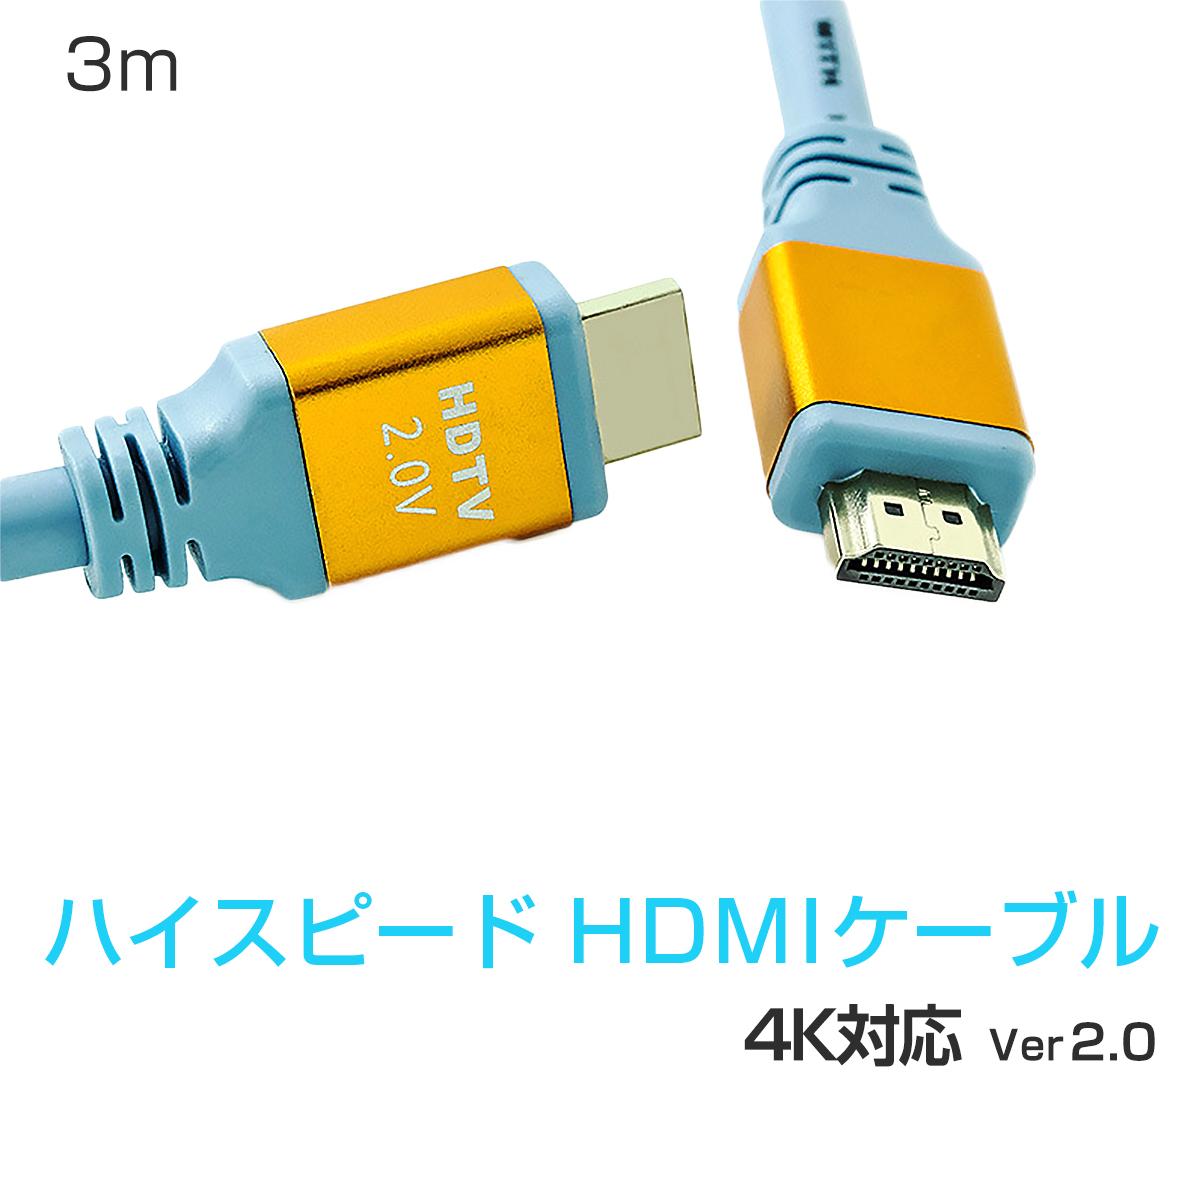 HDMIケーブル ハイスピード Ver2.0 4K/60p UltraHD HDR 3D FHD HEC ARC 3m ノイズキャンセラー付き タイプAオス-タイプAオス 青 SDM便送料無料 1ヶ月保証 K&M